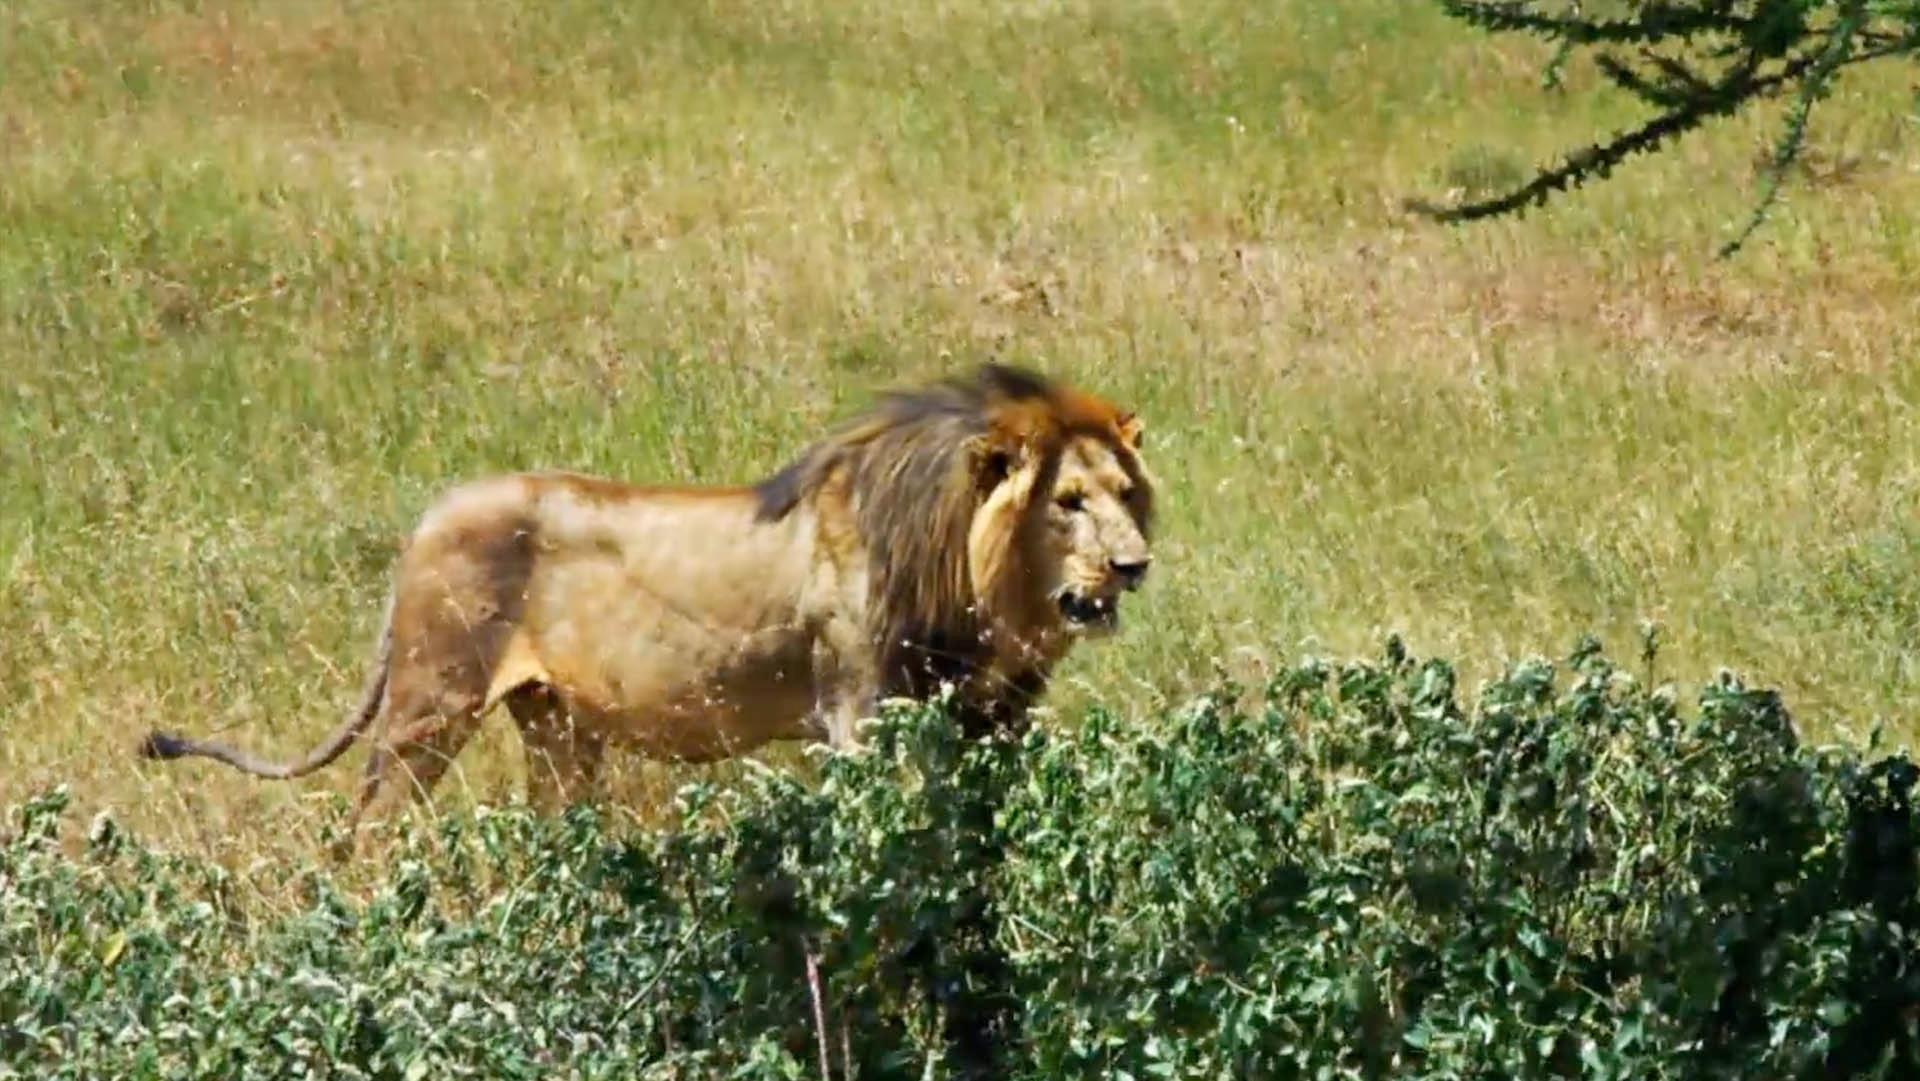 The Serengeti Lion Project